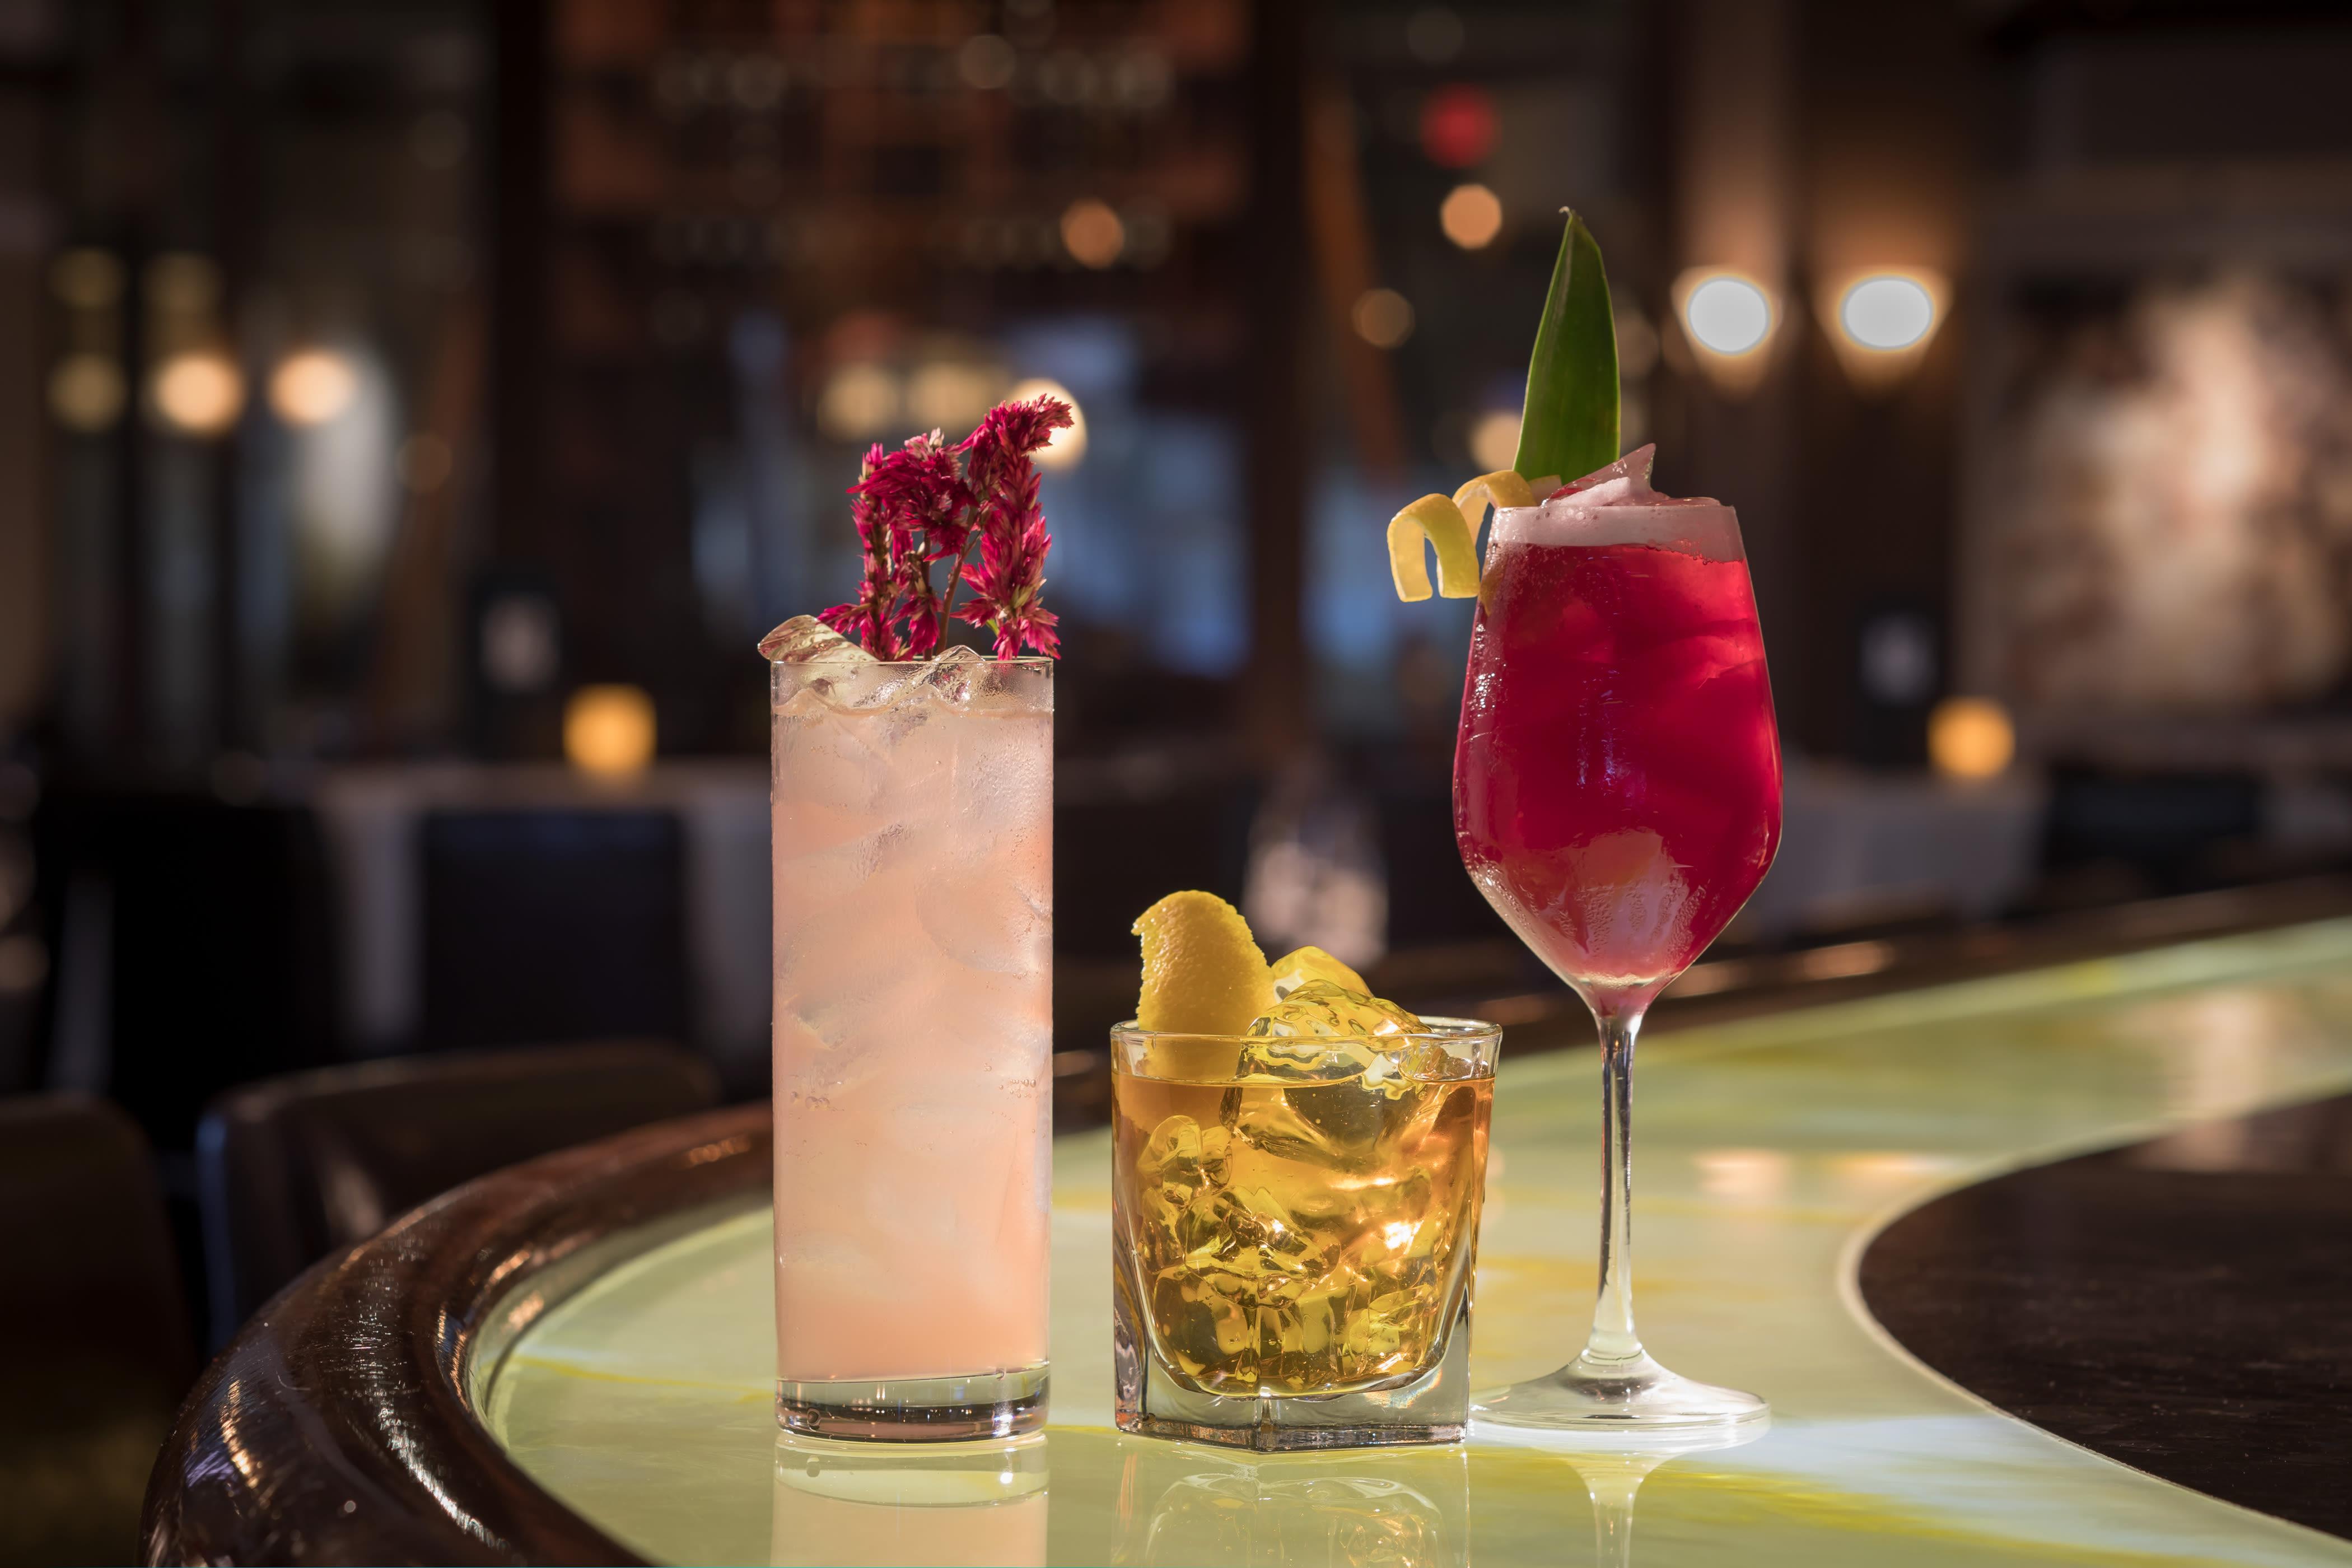 High res perryssteakhouse cocktails7 k7xryp